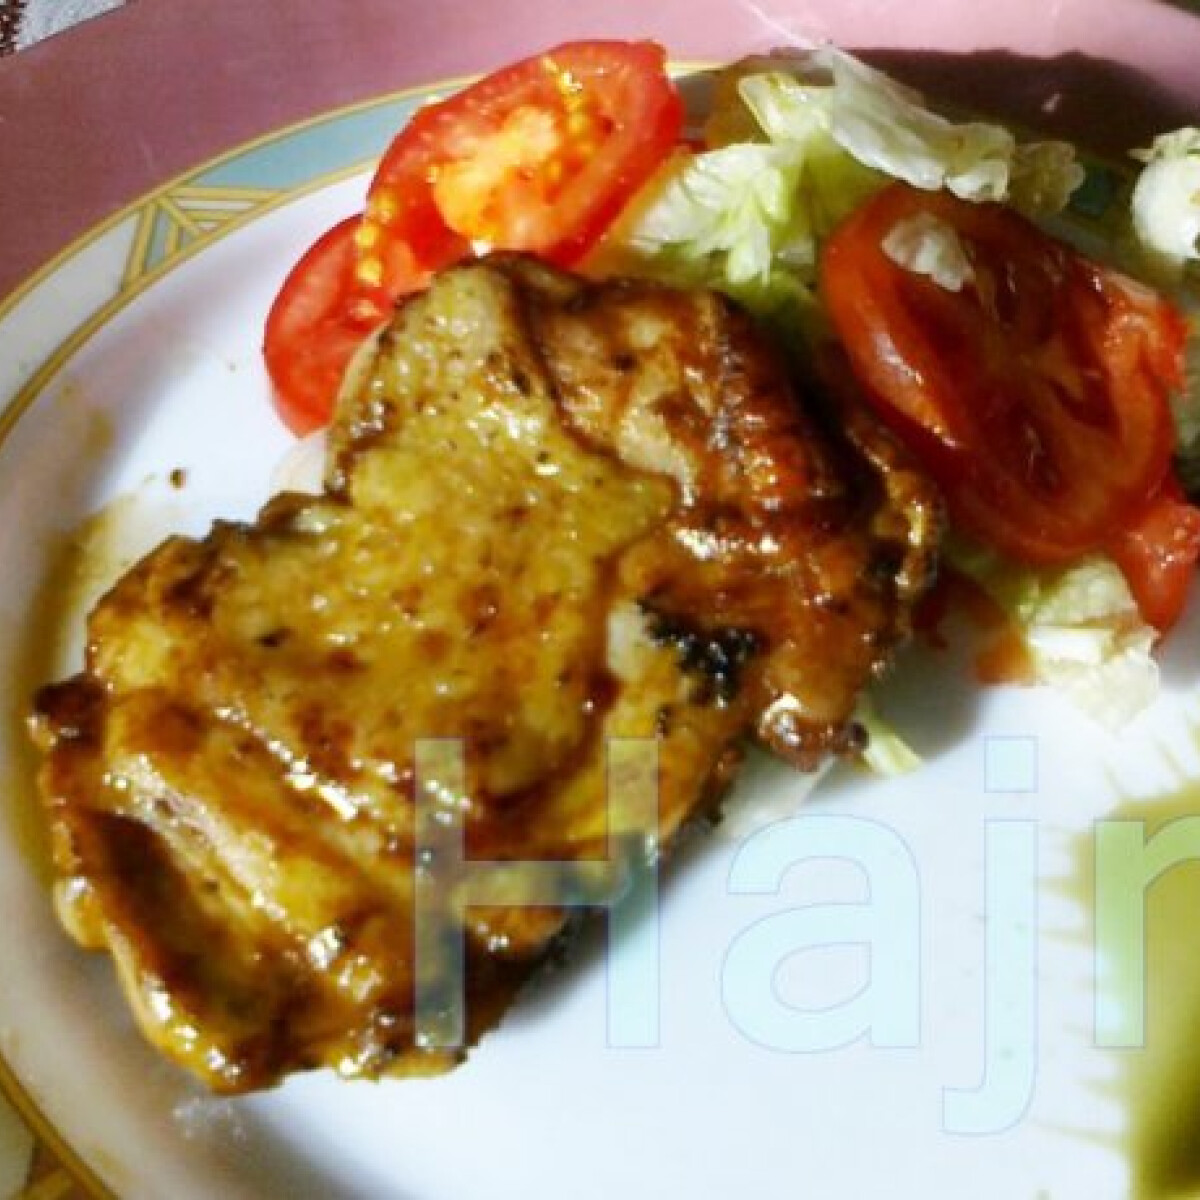 Natúr vasalt csirkecomb salátaágyon